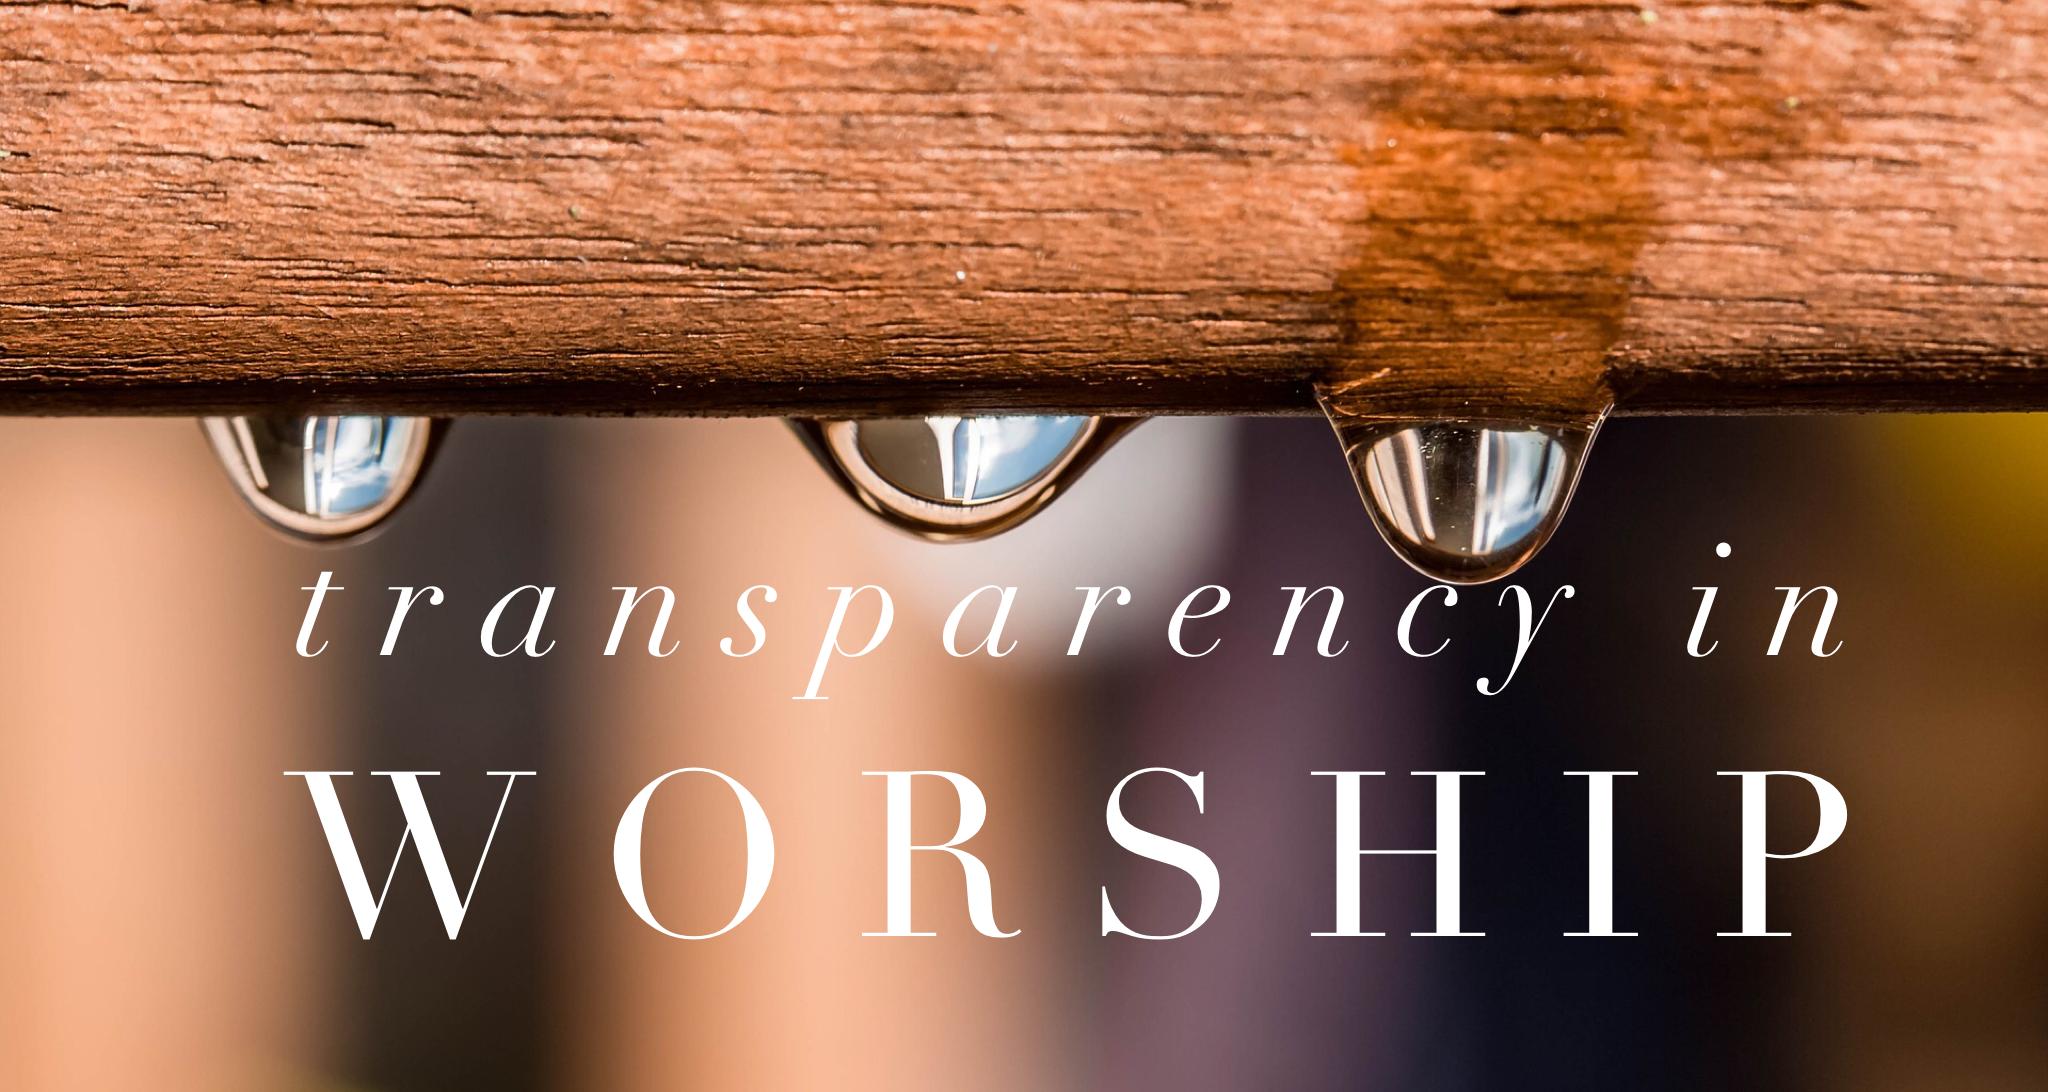 TRANSPARENCY IN WORSHIP